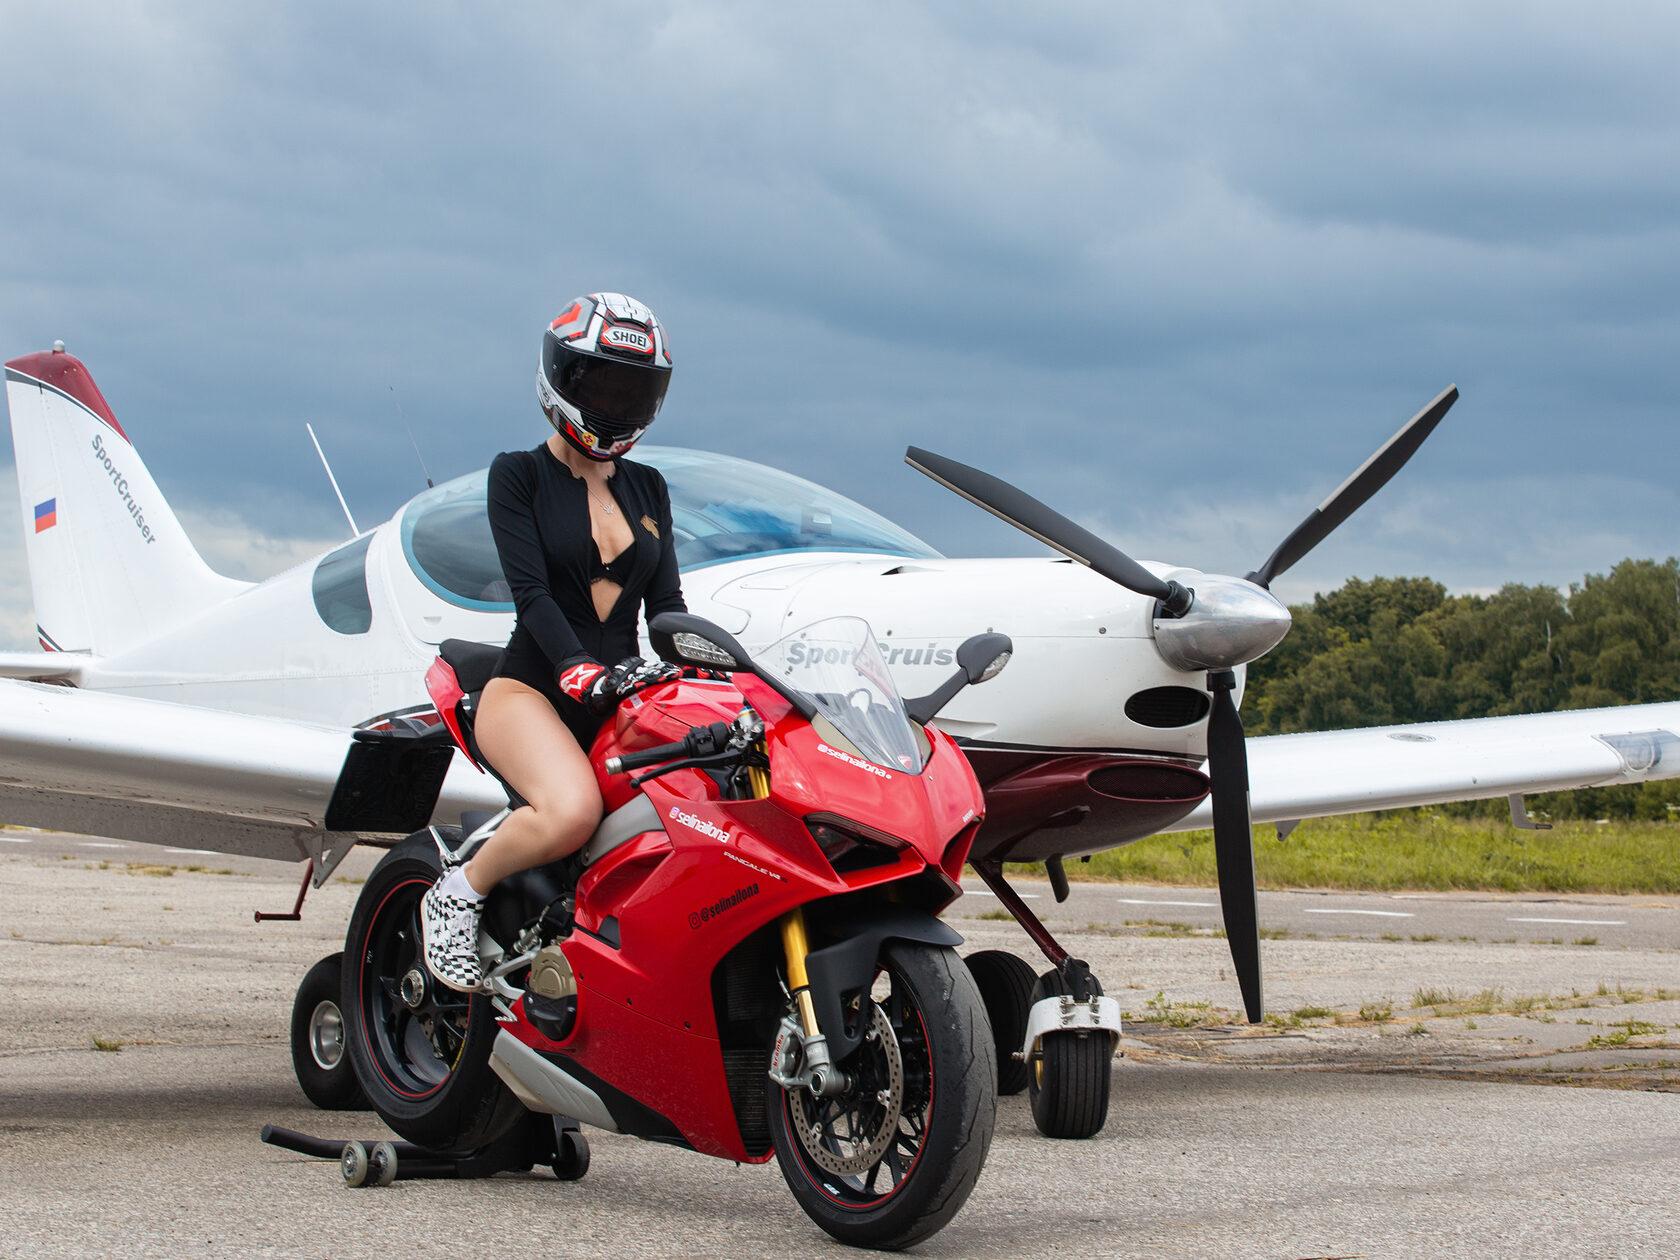 Ducati Panigale V4s, SportCruiser, poletpilot, Selina Ilona